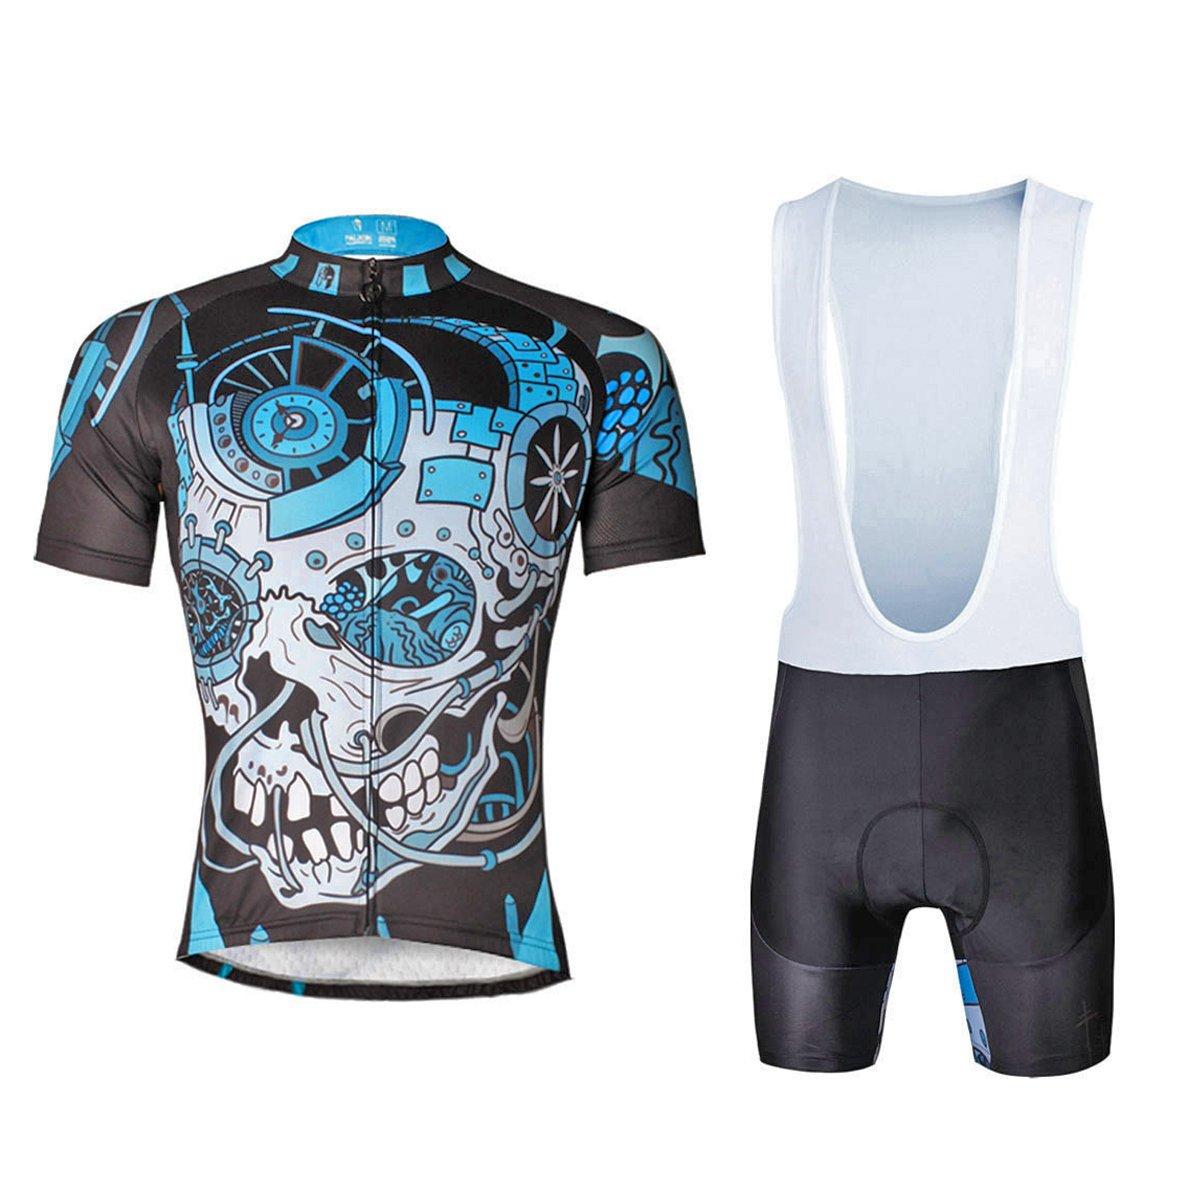 Ilpaladino Men's Black Cycling Shirts Mechanical Skeleton Pattern Bike Jerseys Tight Design